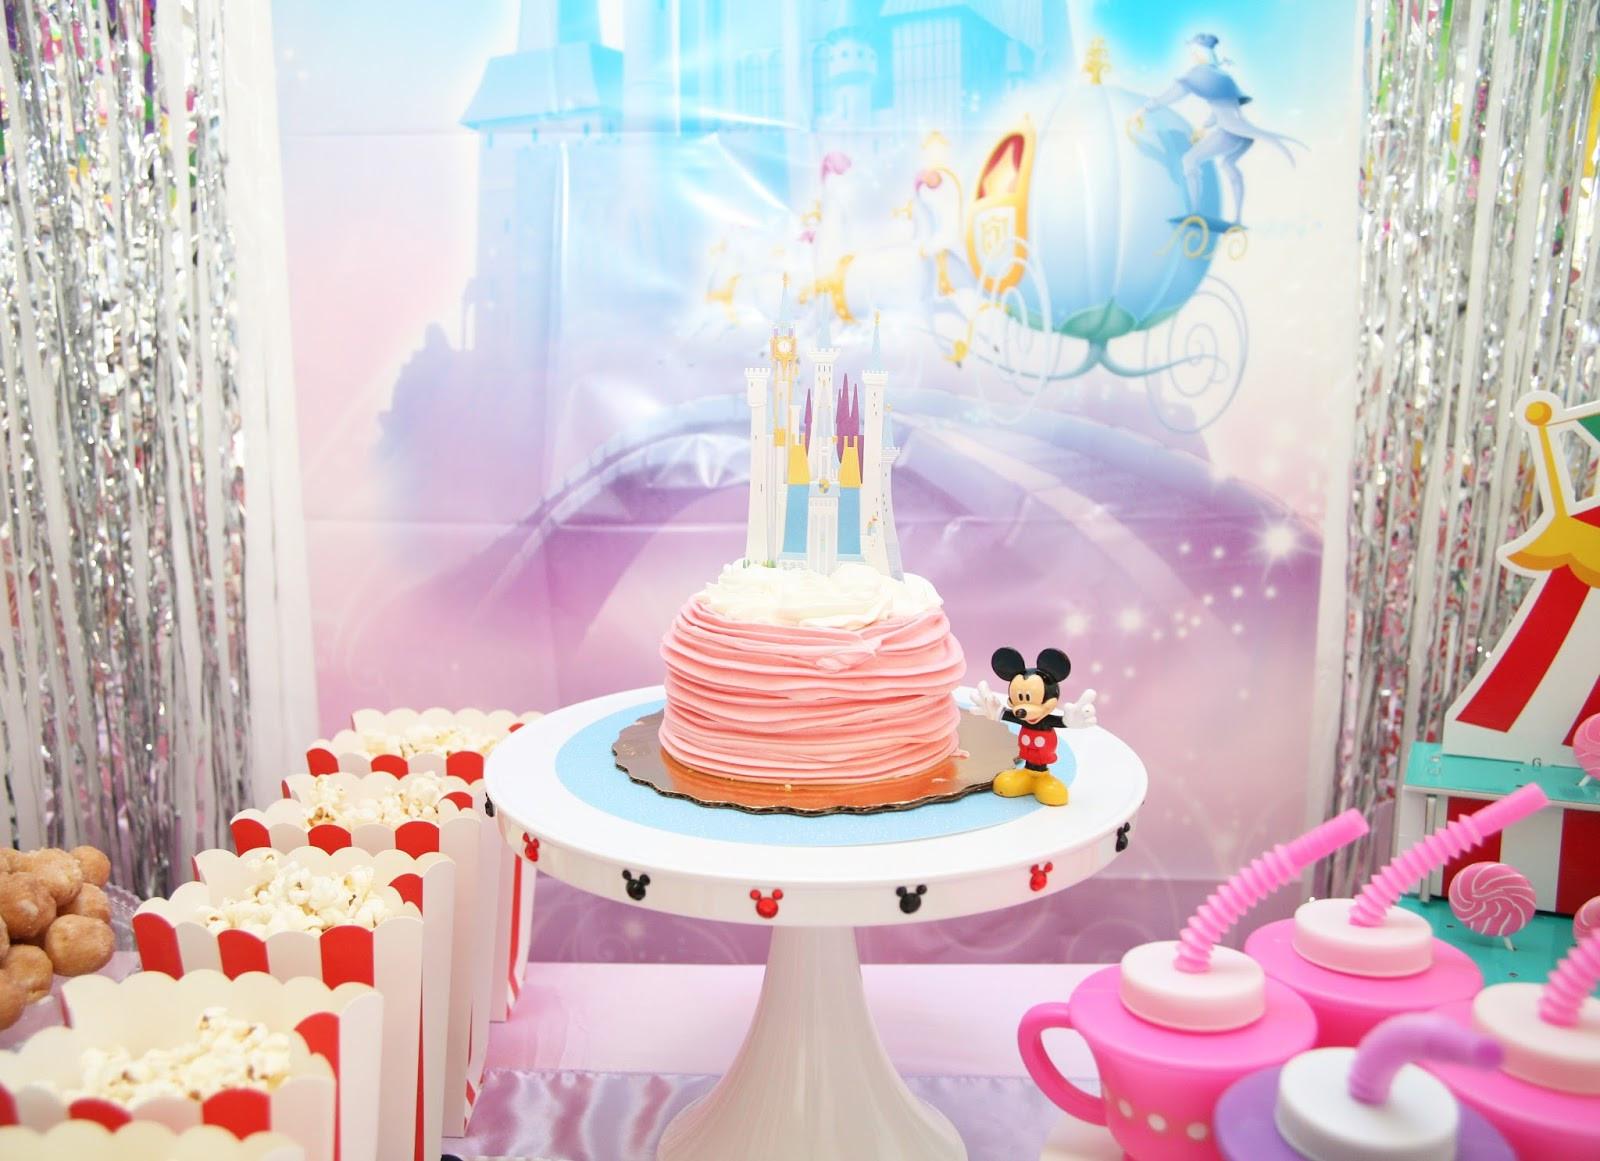 Best ideas about Disneyland Birthday Party . Save or Pin Walt Disney World Birthday Party Now.